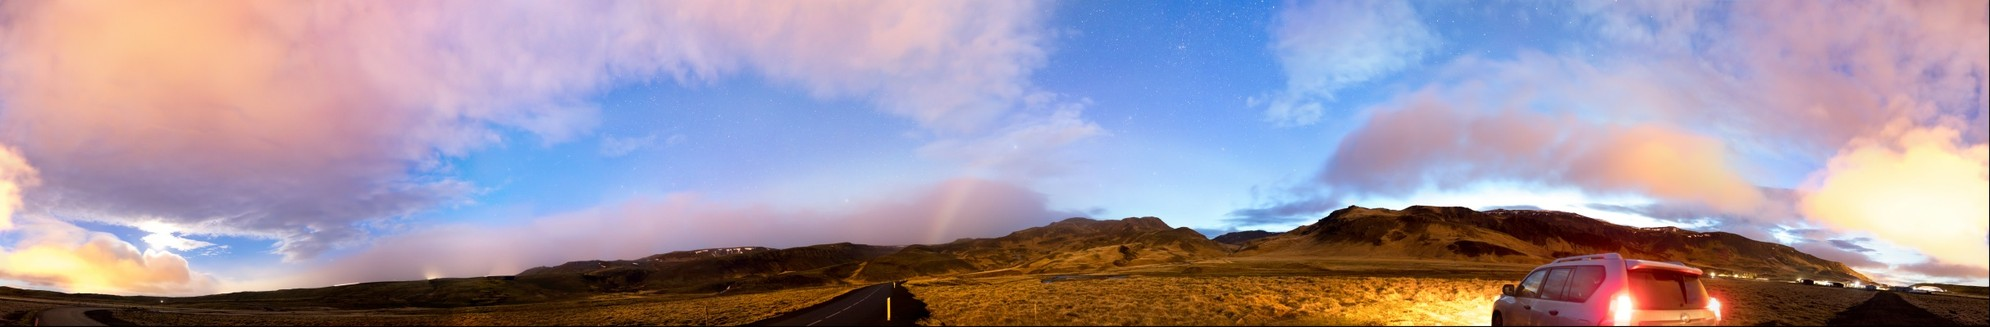 Iceland - Feb 2017 - Panorama 17